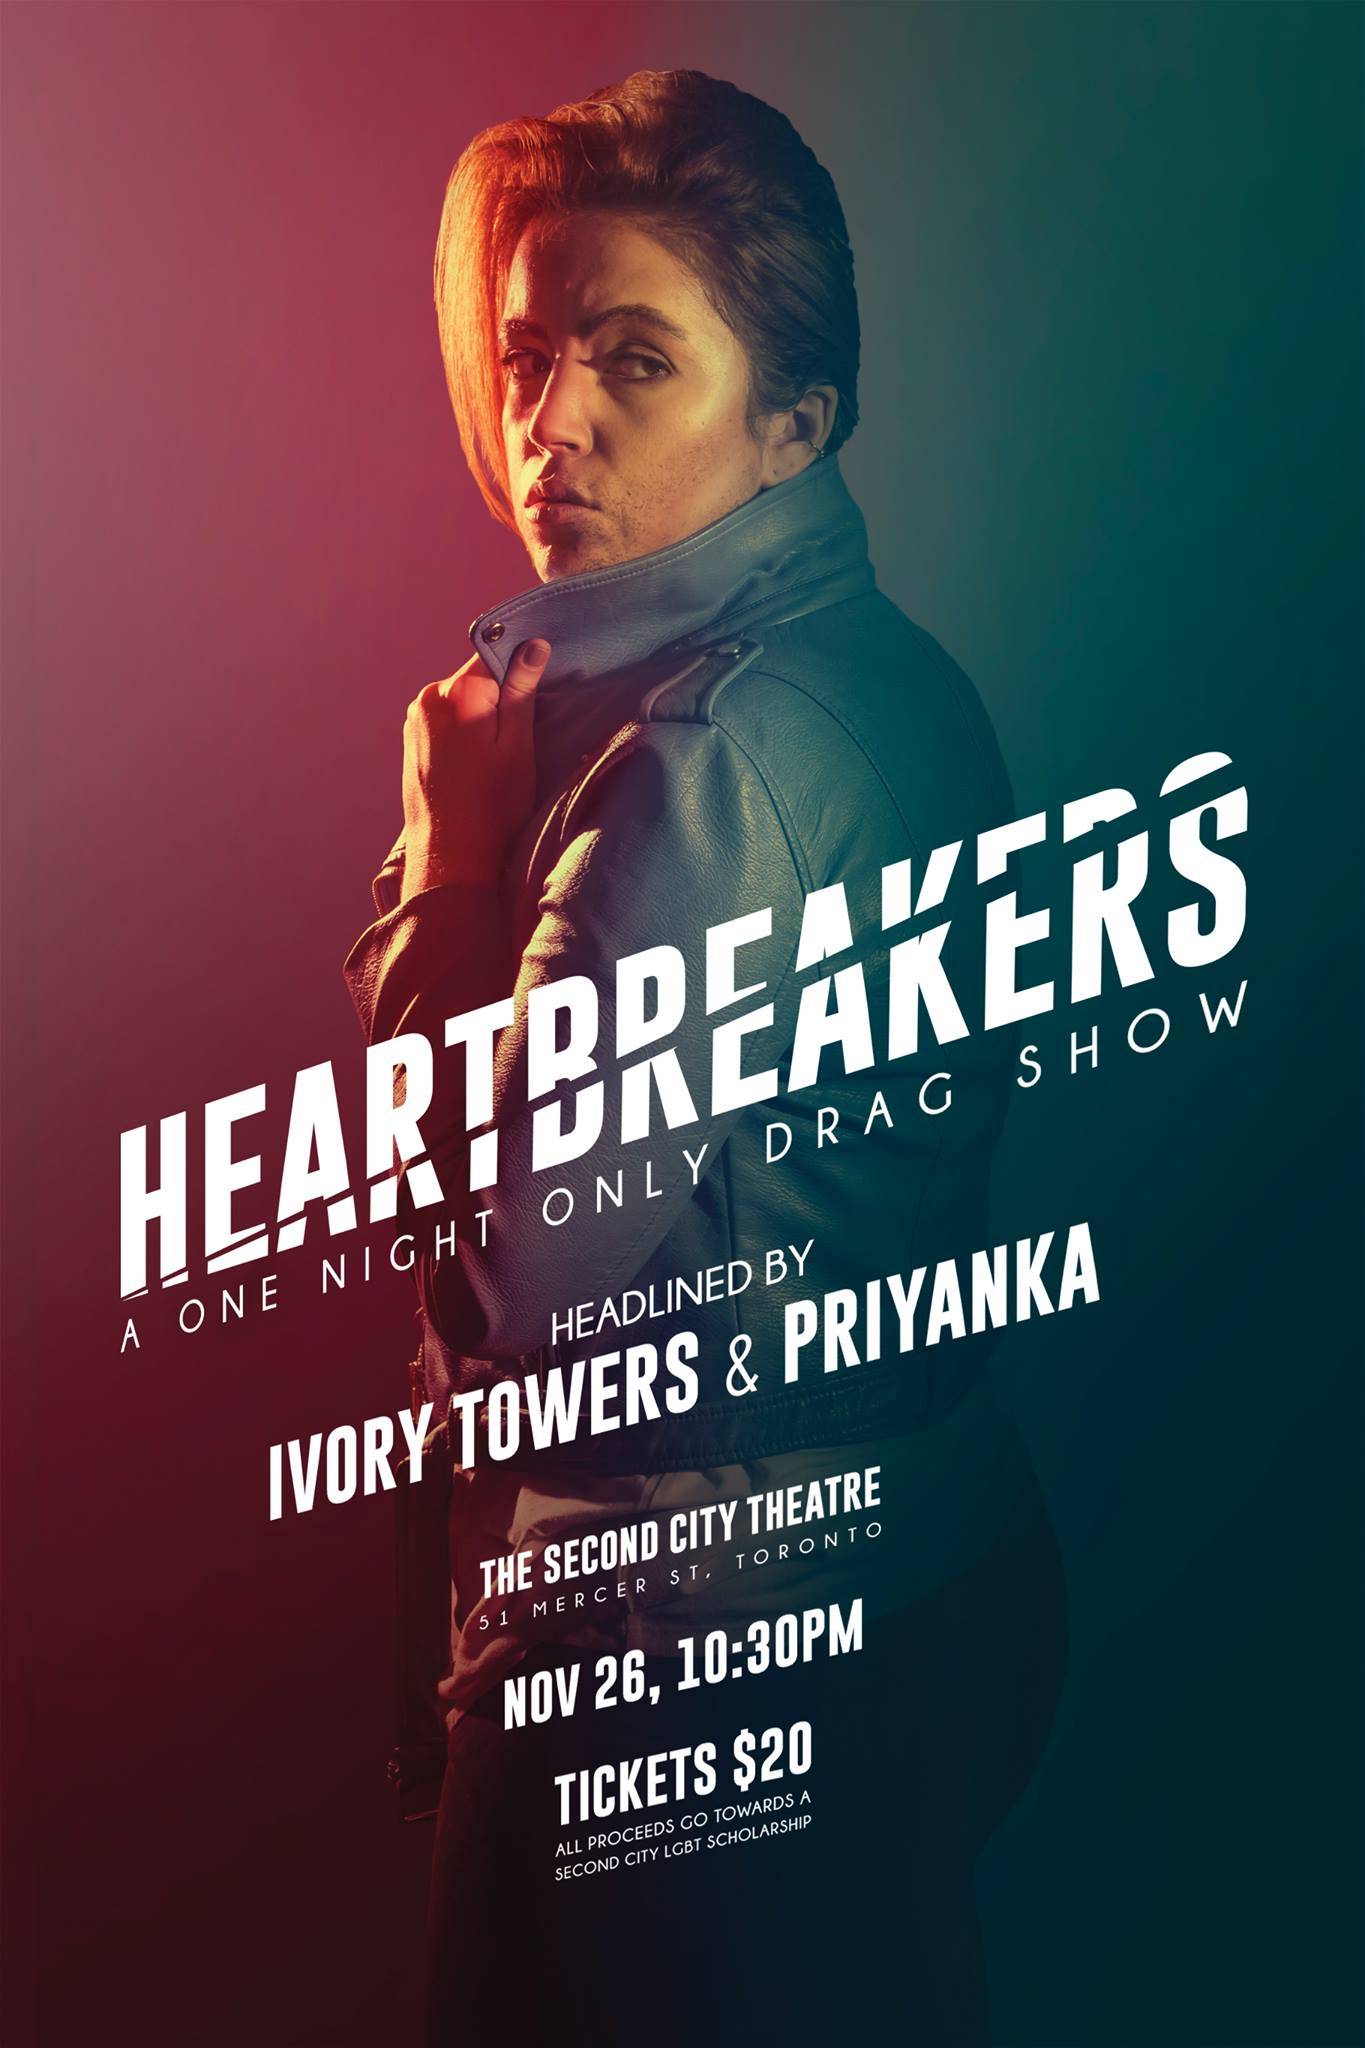 heartbreakers-toronto.jpg